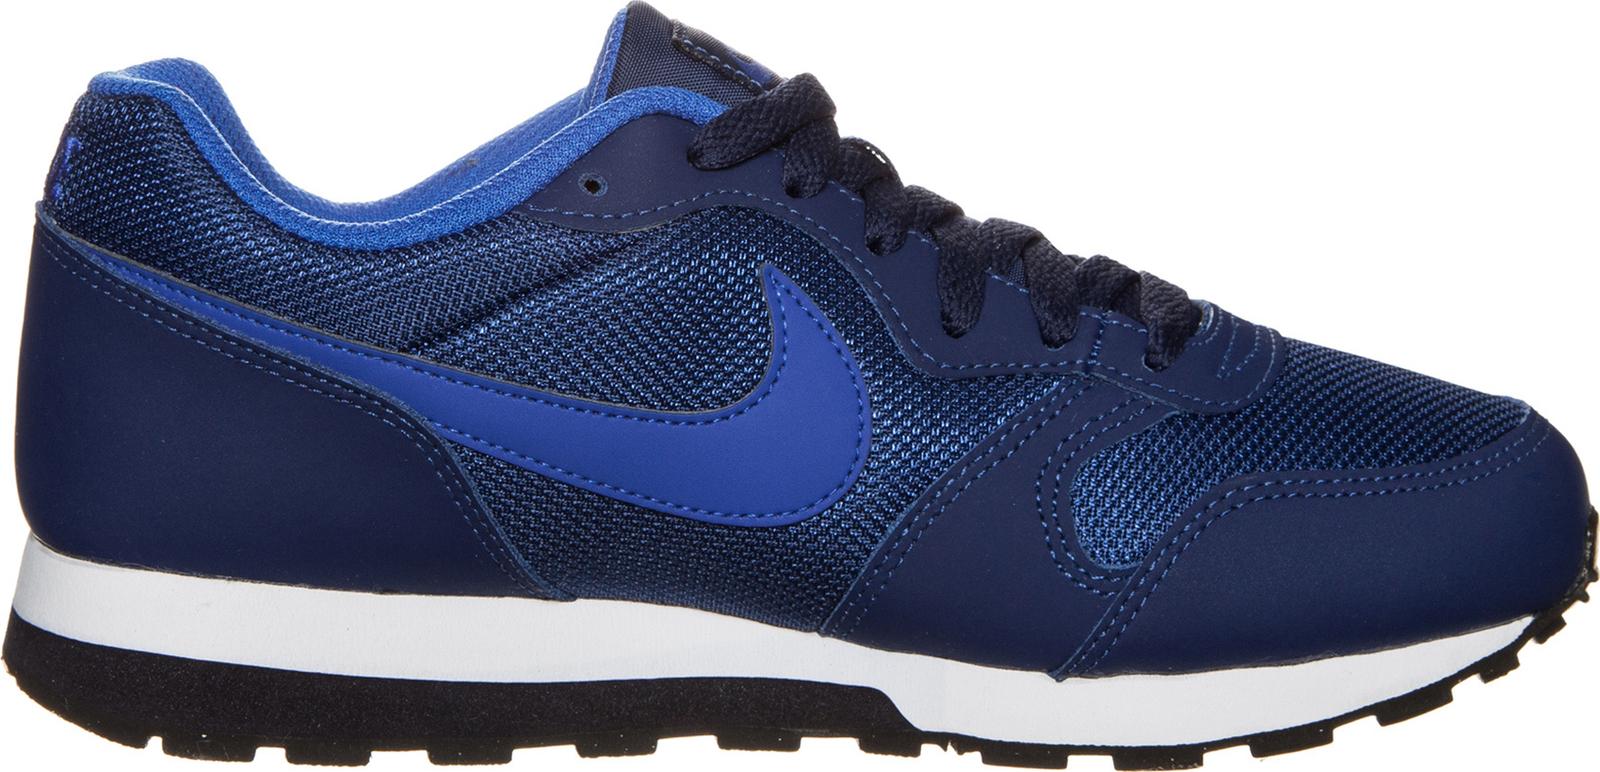 0873a7a79 Προσθήκη στα αγαπημένα menu Nike Md Runner 2 GS